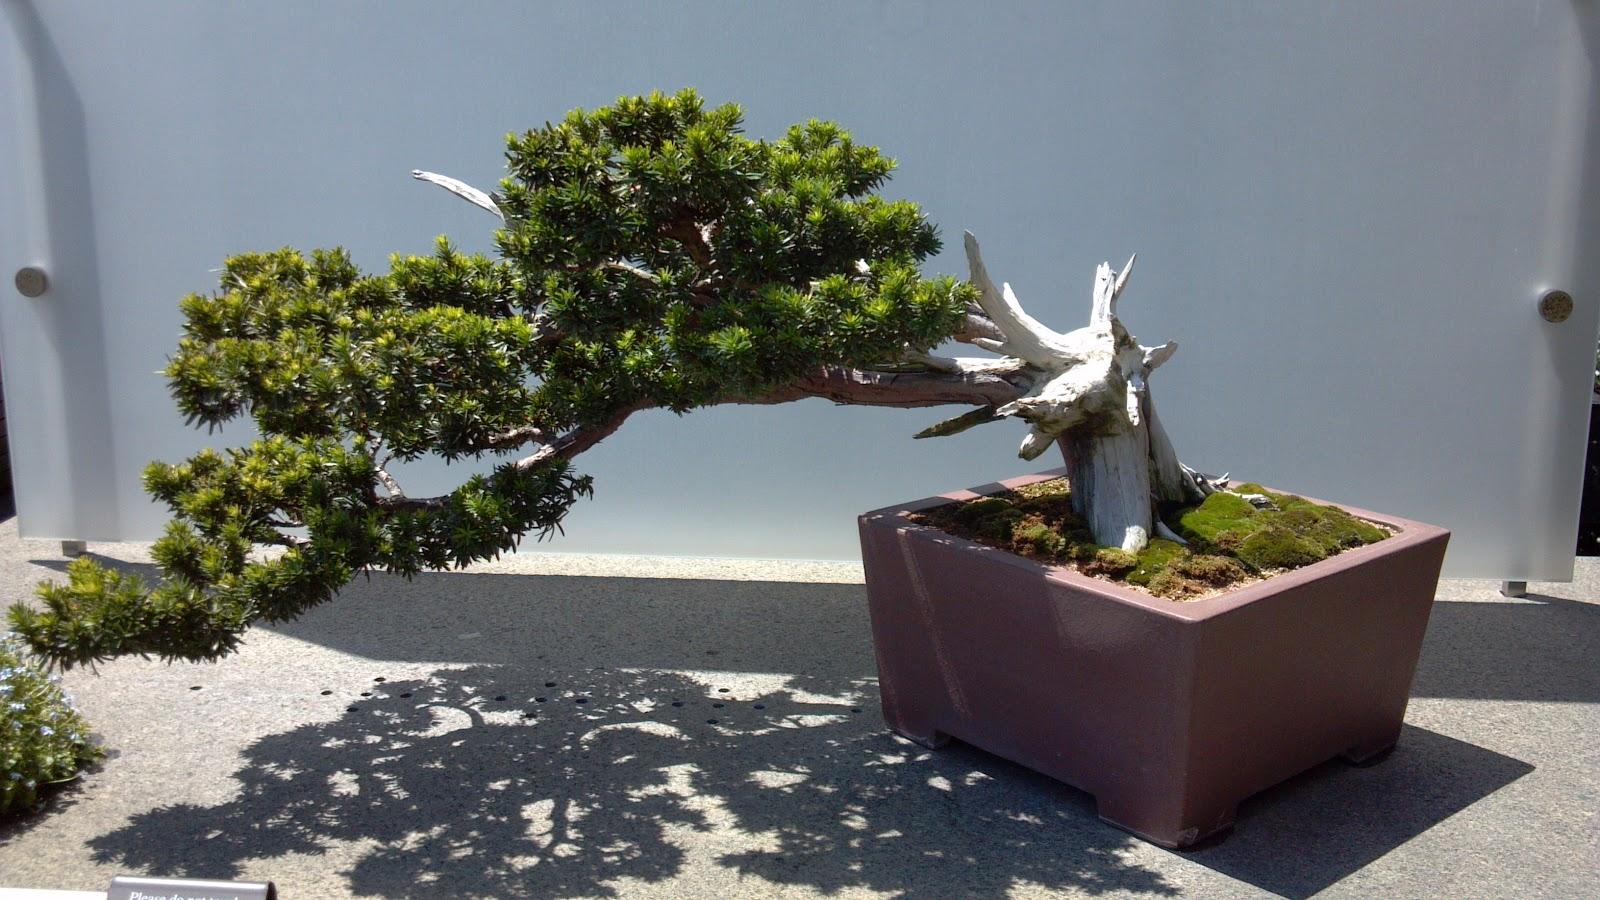 Artist Holiday The Bonsai